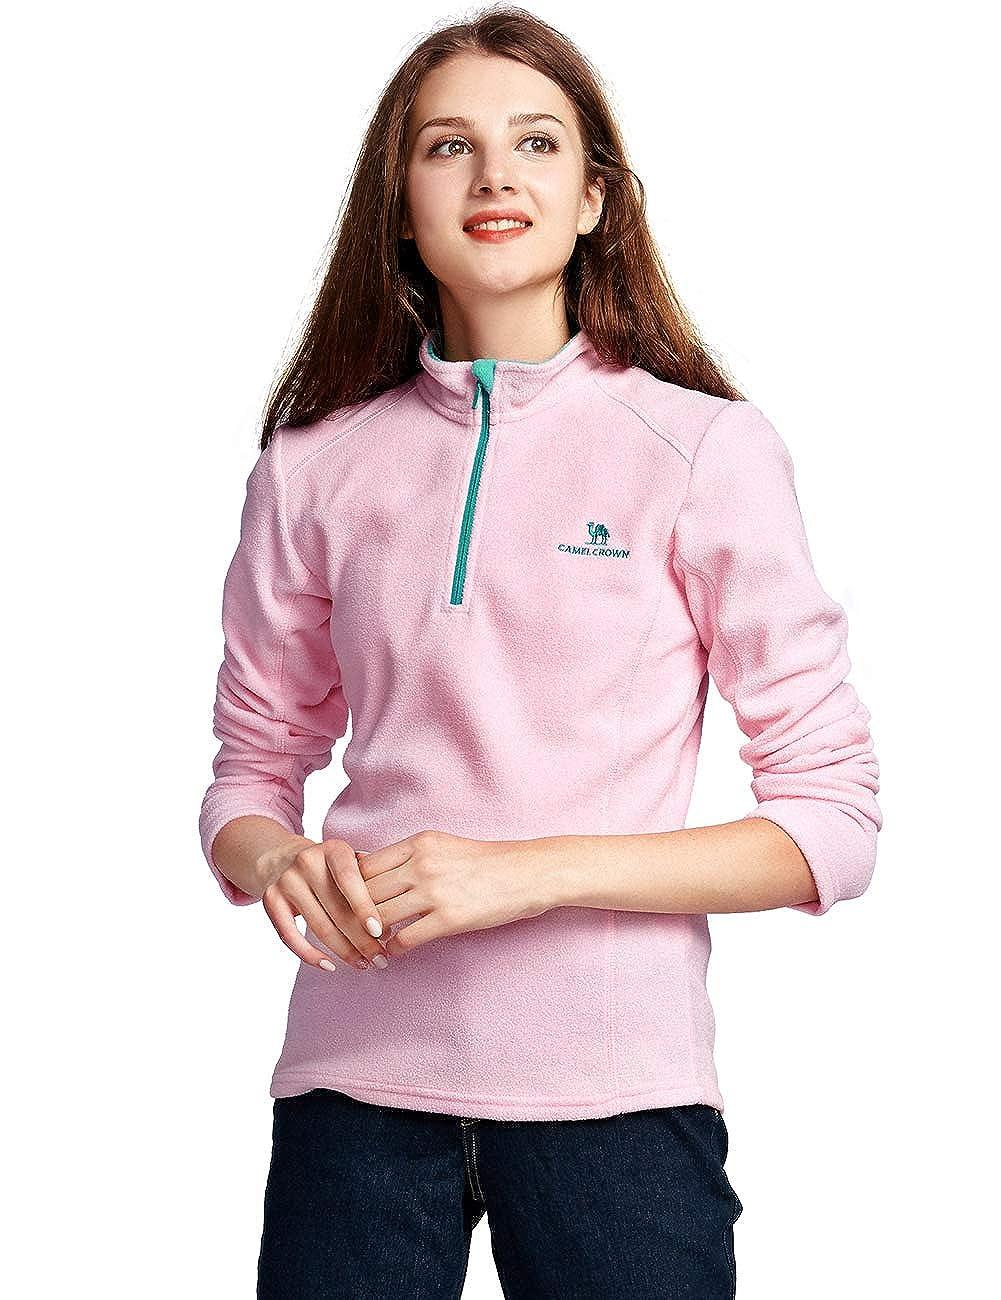 Camel Half Zip Fleece Jacket Women Lightweight Long Sleeve Fleece Pullover for Fall and Winter Z8W103122-CLUS